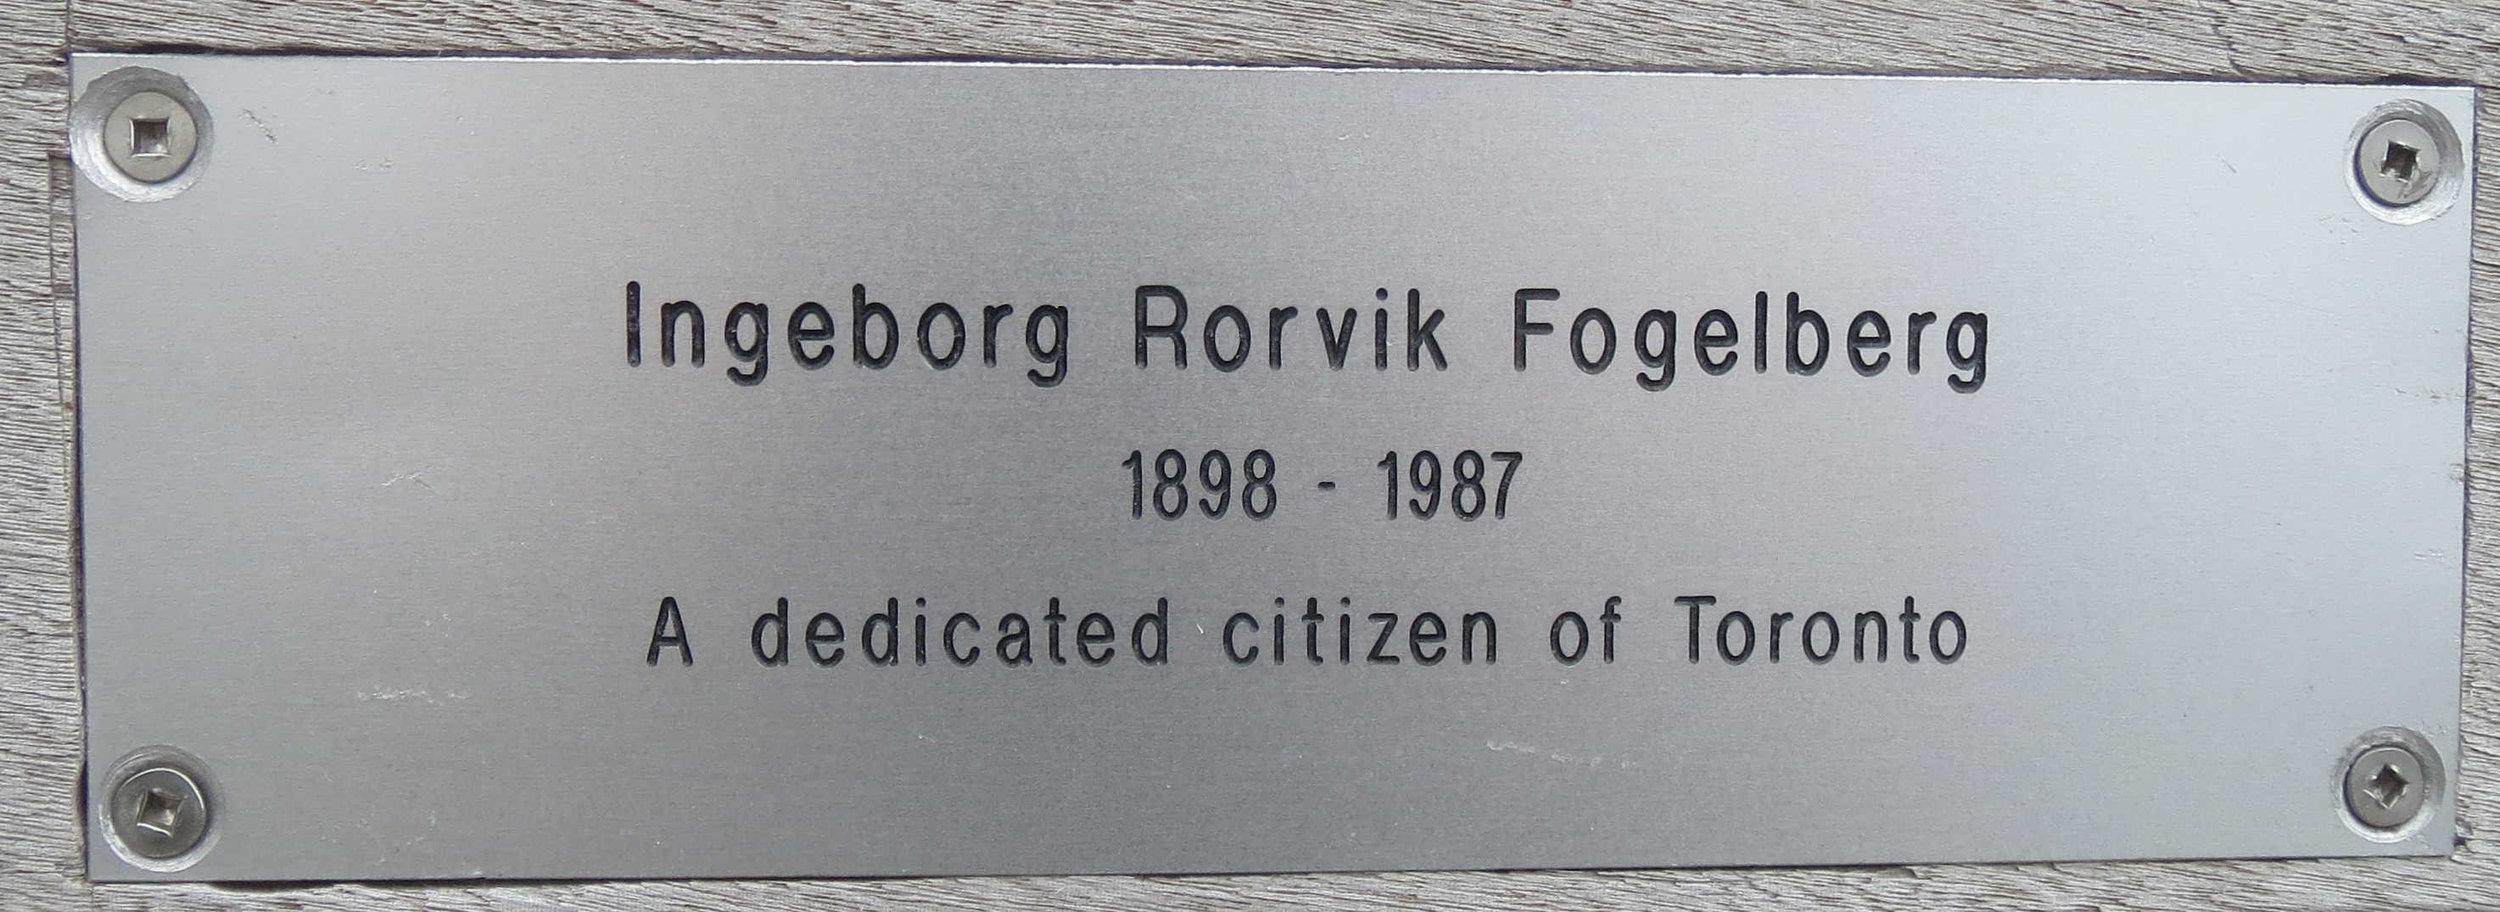 Fogelberg AGC 1 IMG_8544.jpg